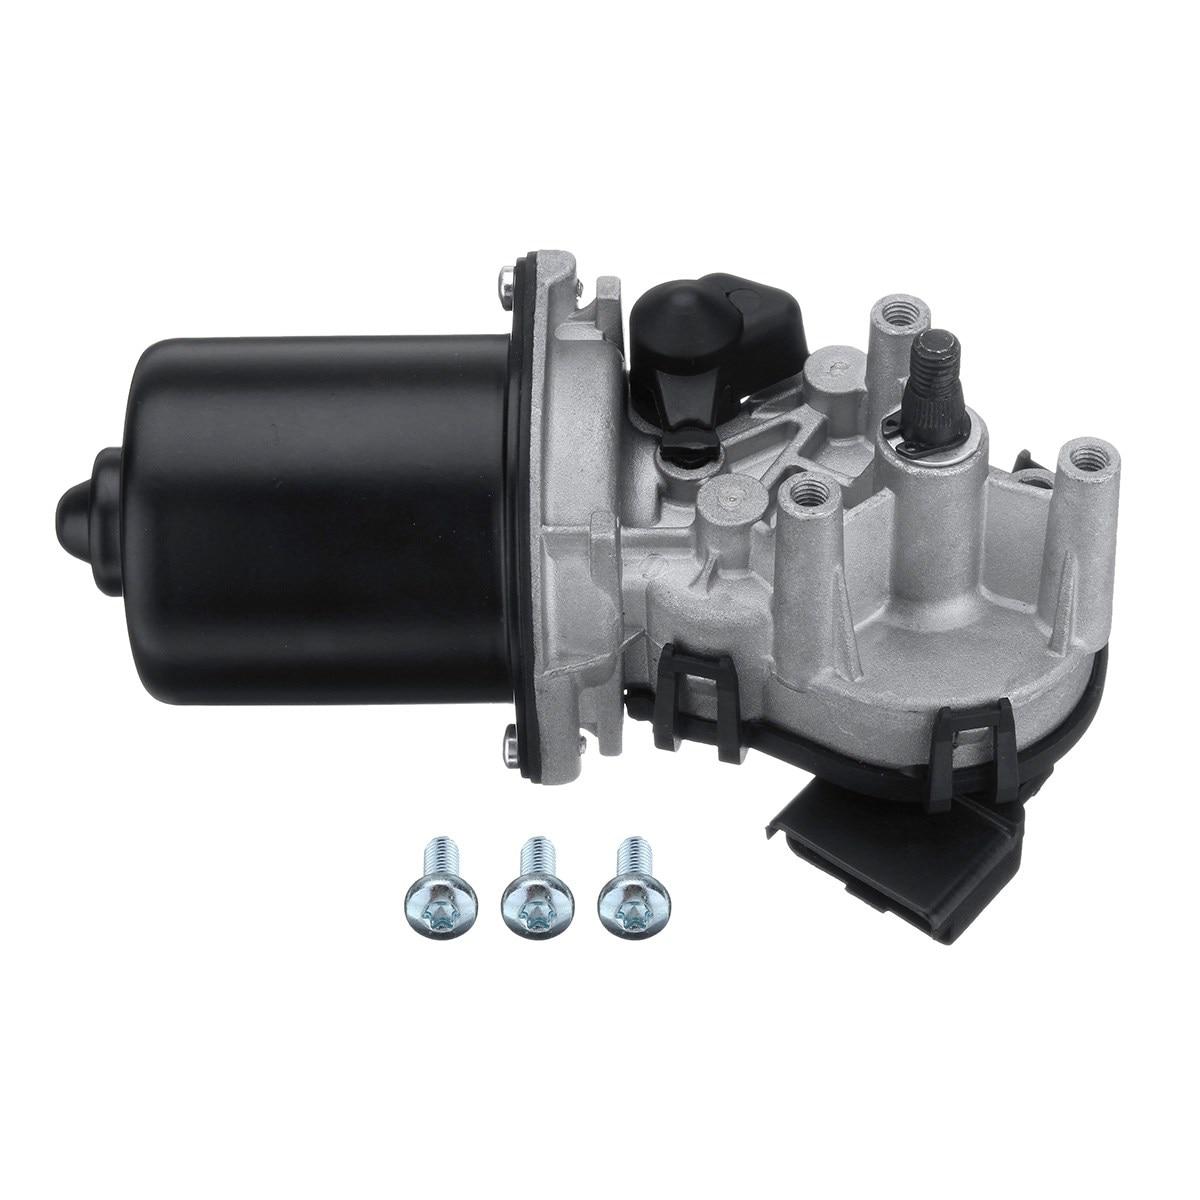 Car Front Windscreen Wiper Motor For Nissan Qashqai 1.5 2.0 2007 2008 2009 2010 2011 2012 2013 28800-JD000